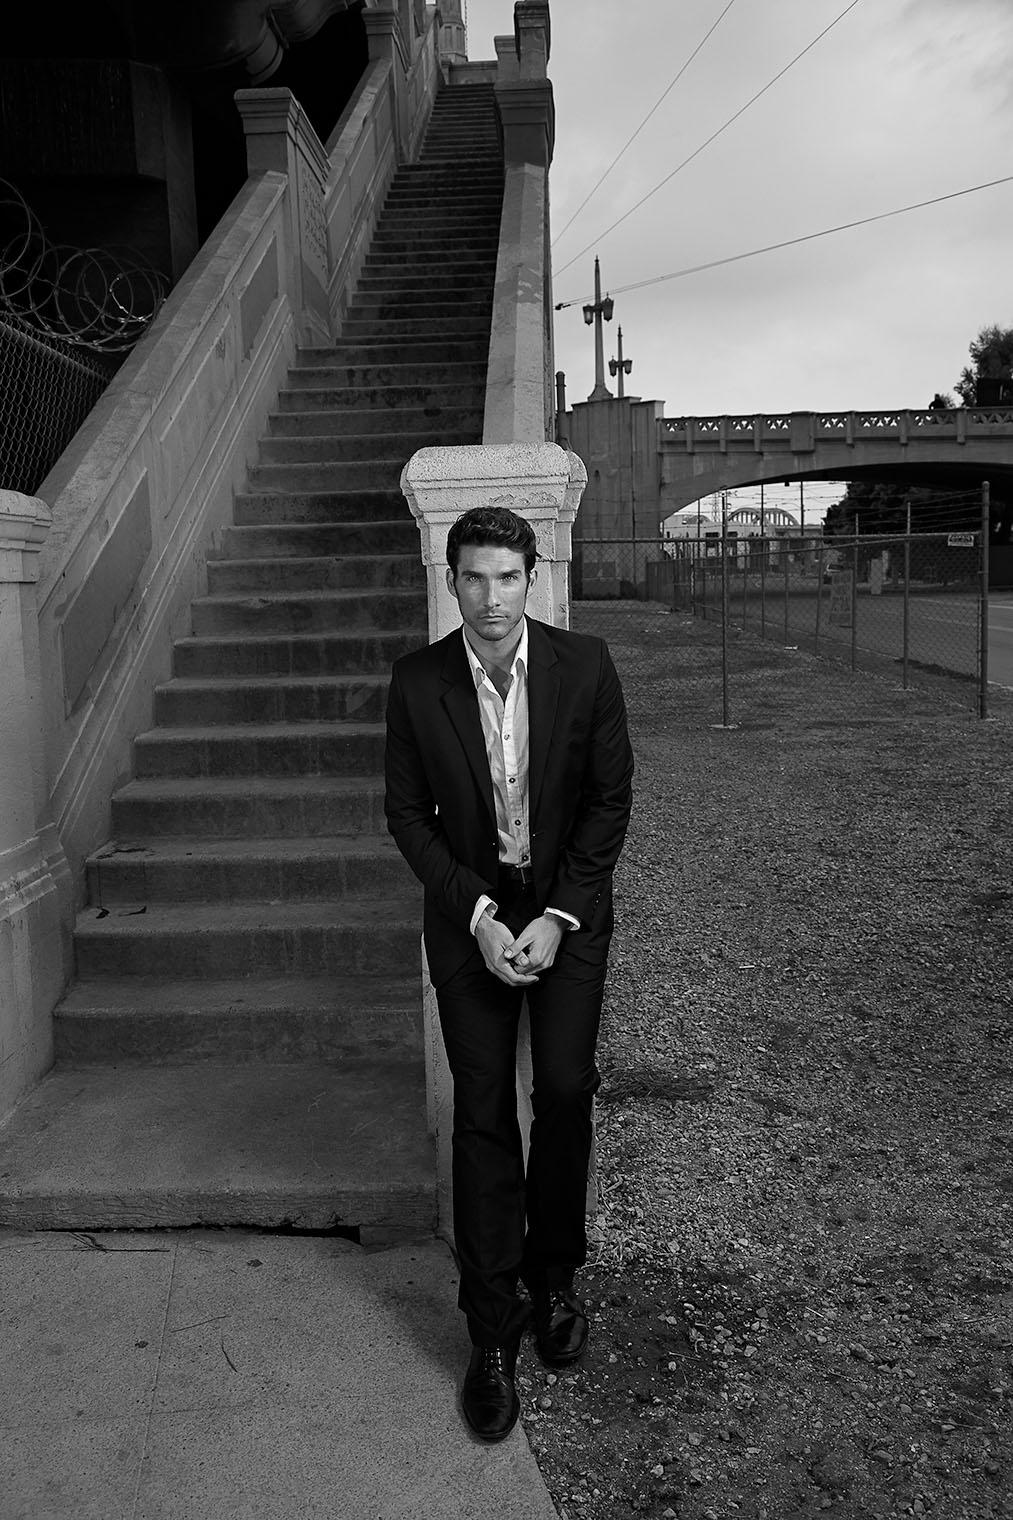 portrait of man at bridge - black and white - fashion portrait